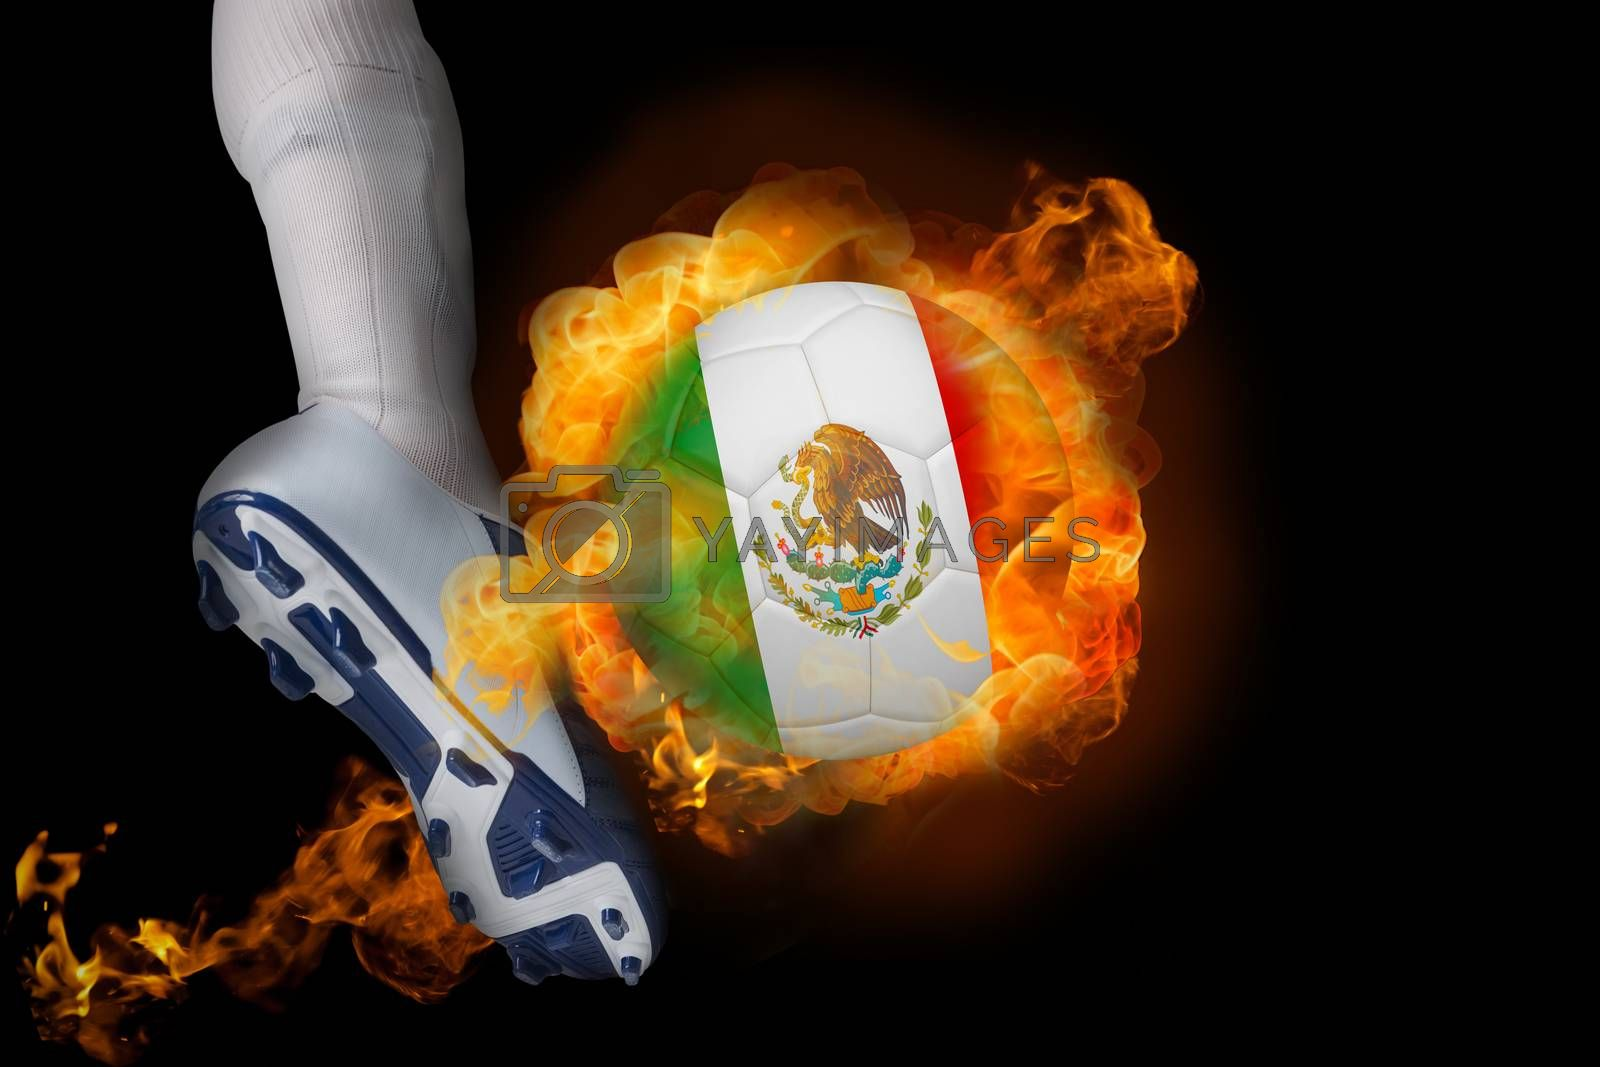 Football player kicking flaming mexico ball by Wavebreakmedia